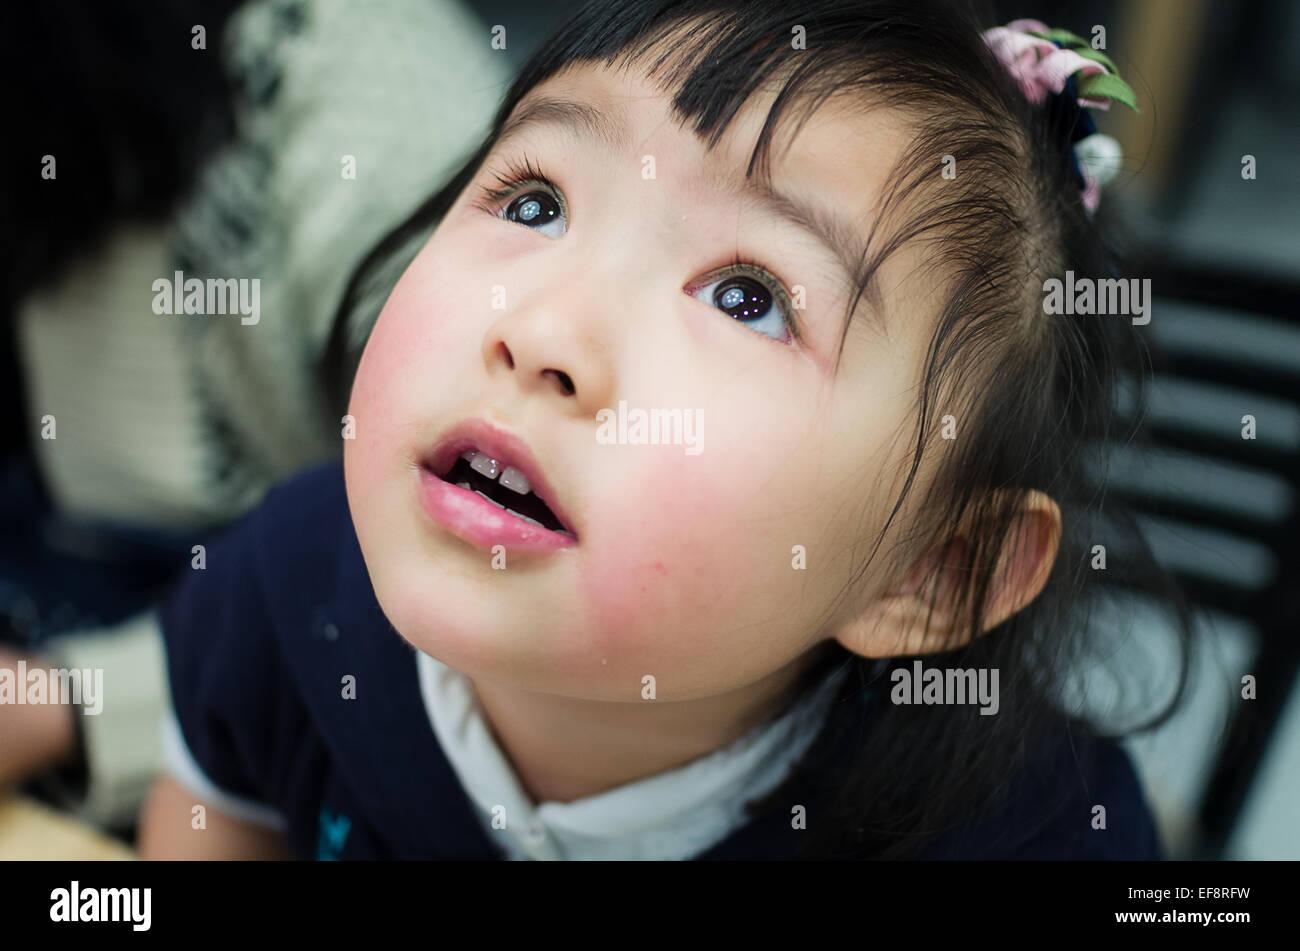 Australia, Melbourne, Headshot of young girl looking up - Stock Image